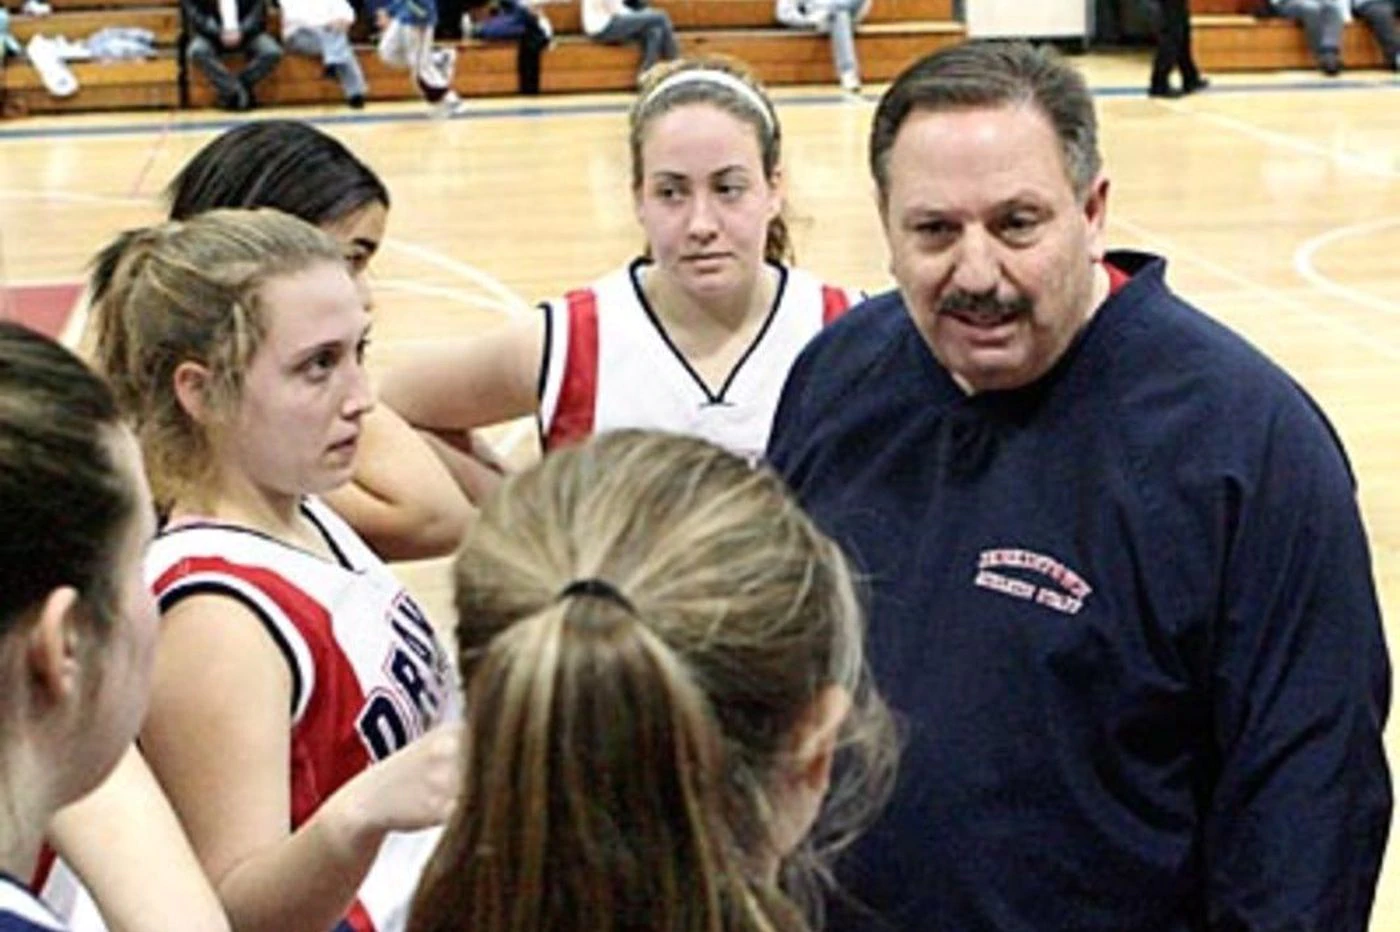 Jenkintown Girls Basketball Team Continues Amazing Winning Streak